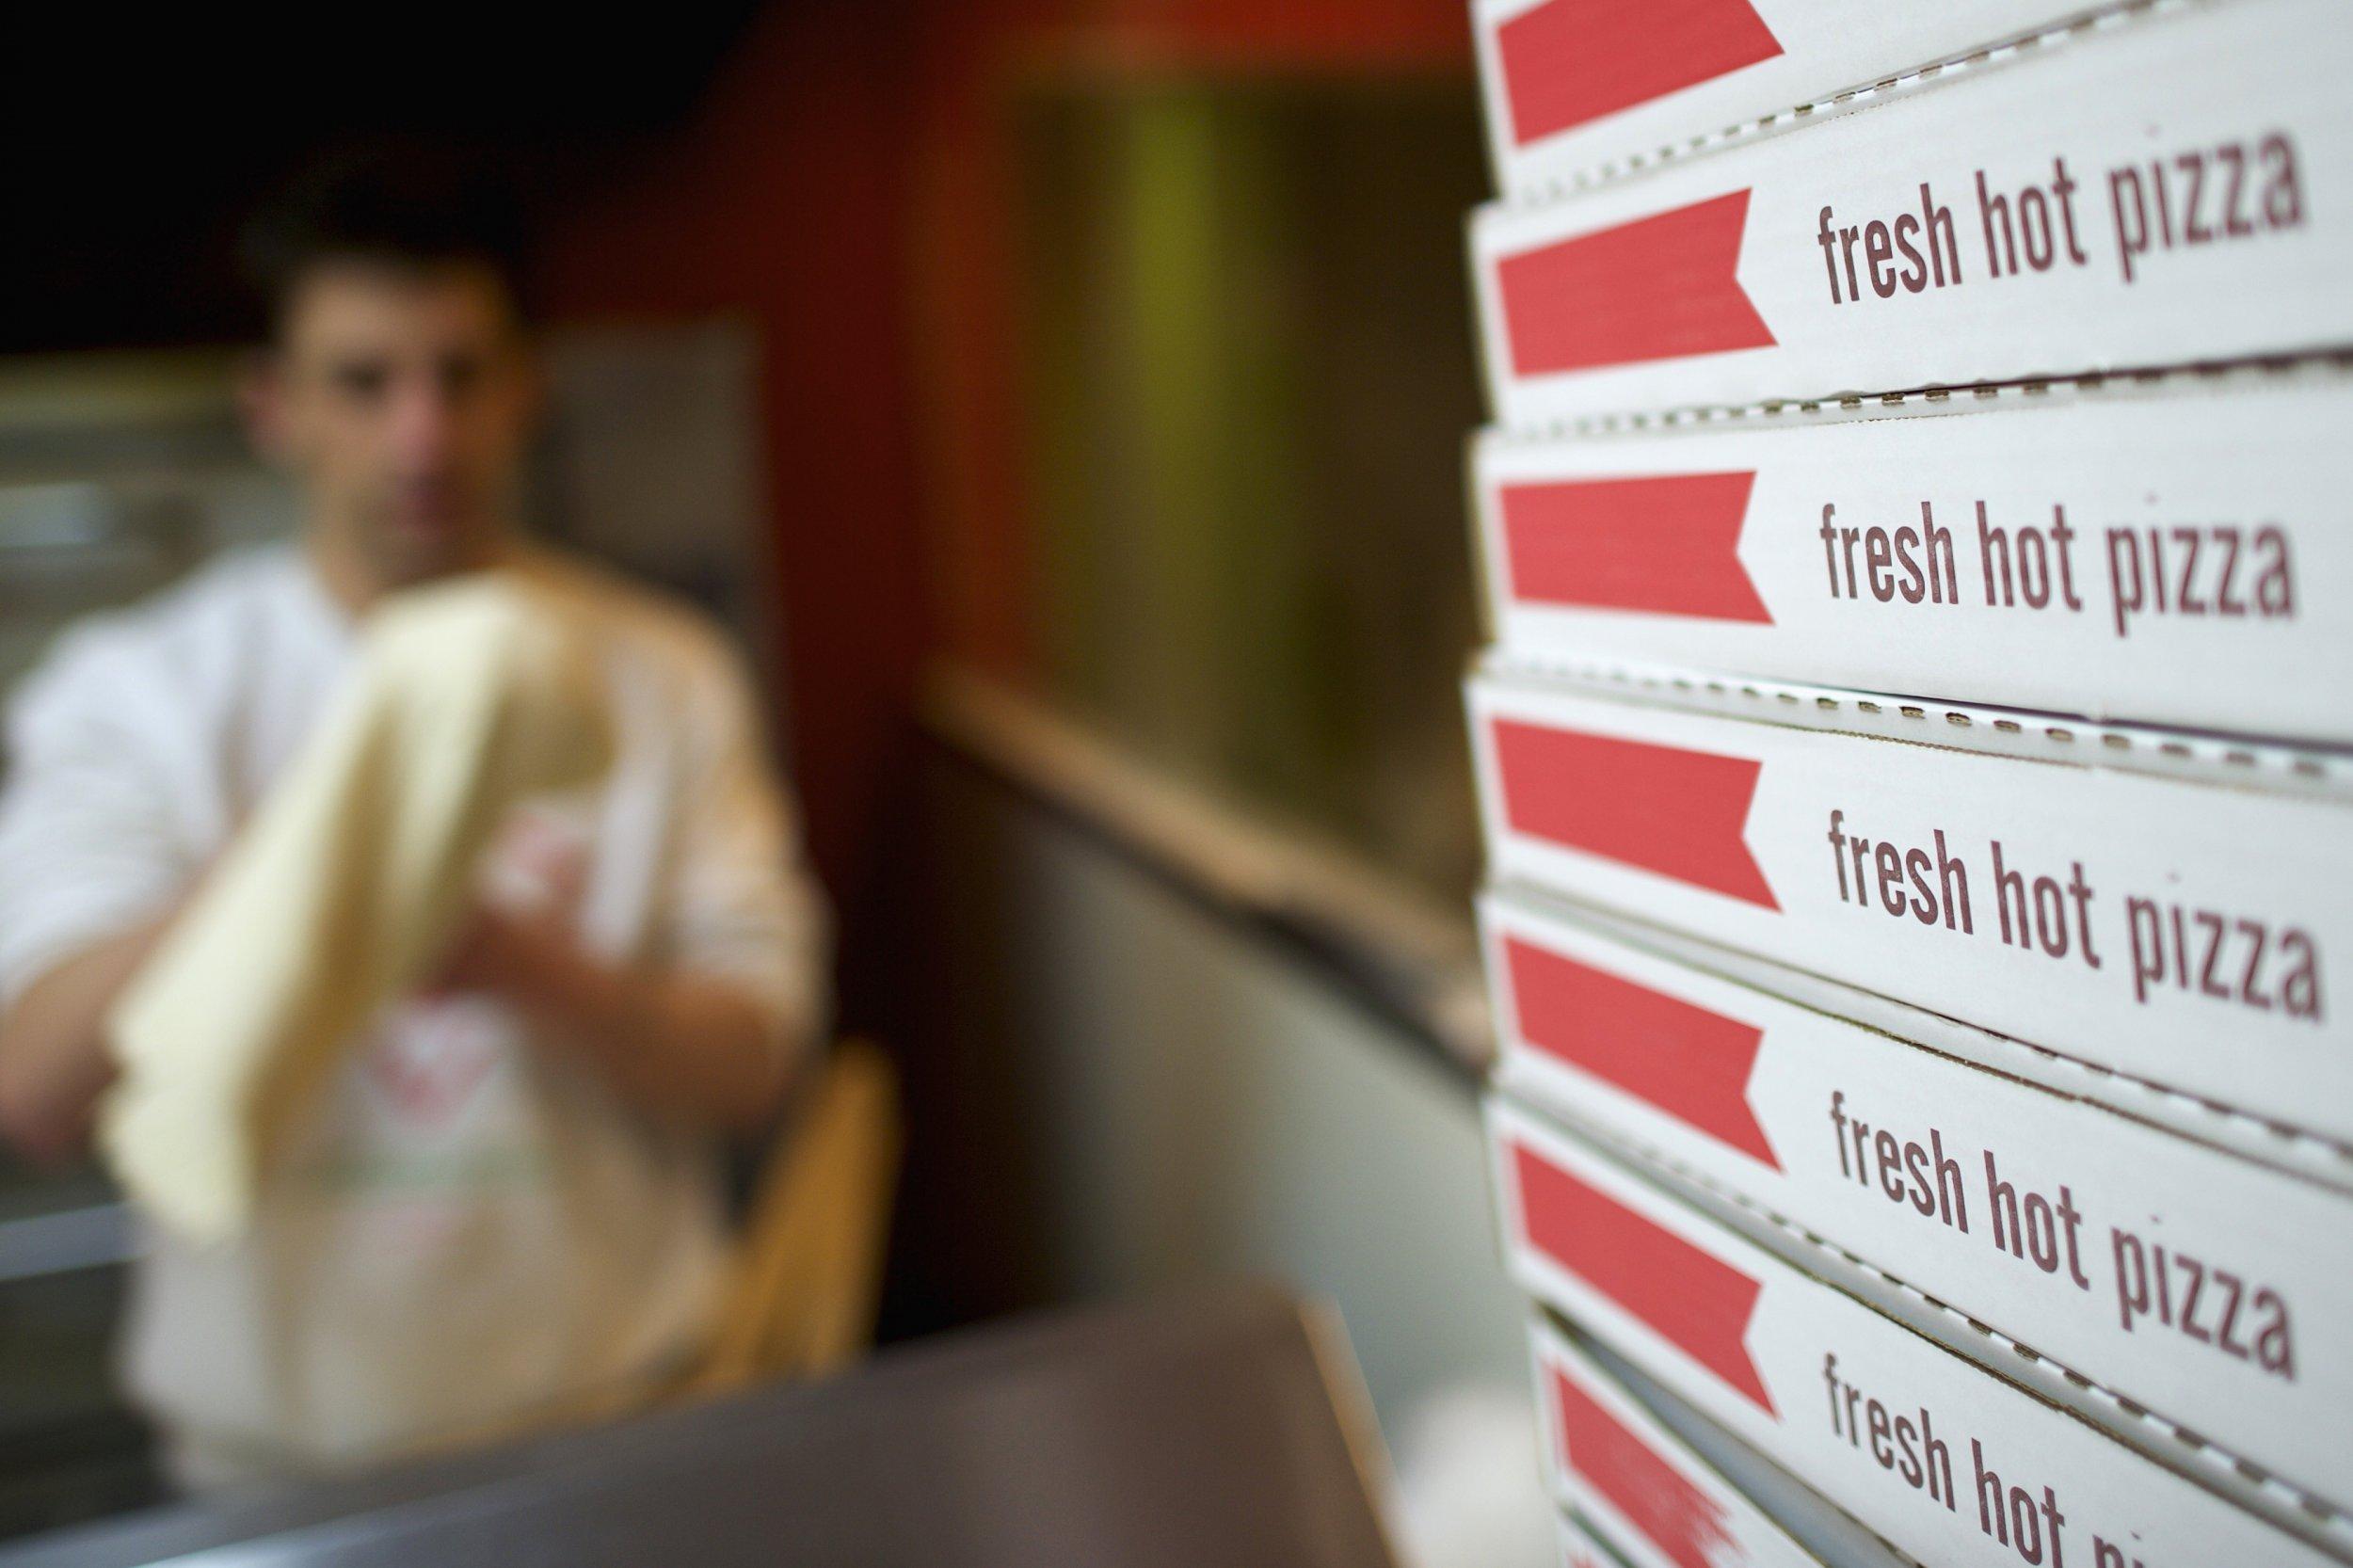 18pizzaboxes